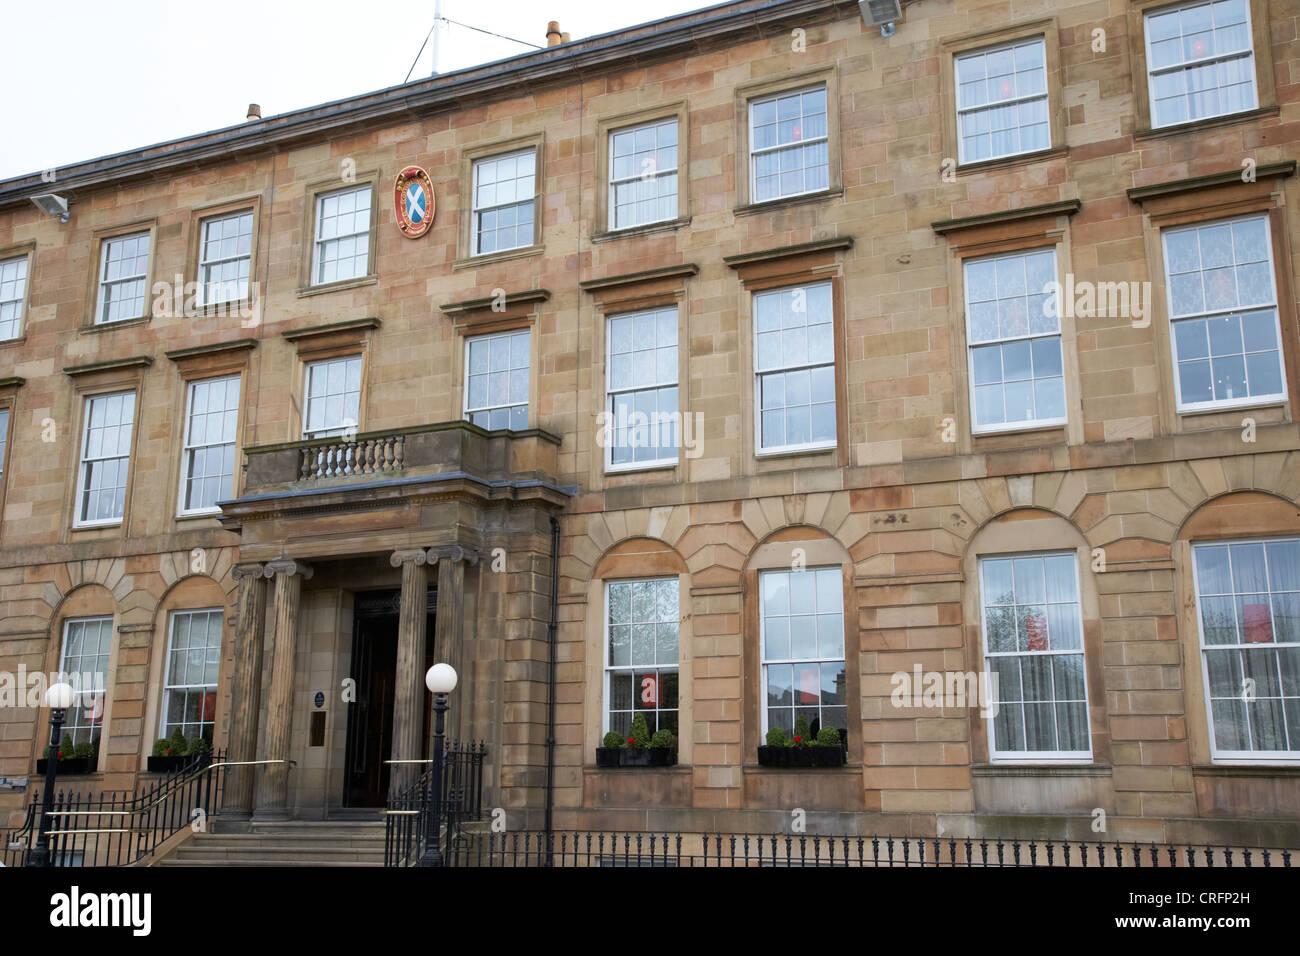 royal scottish automobile club georgian townhouse now the blythswood square hotel glasgow scotland uk - Stock Image